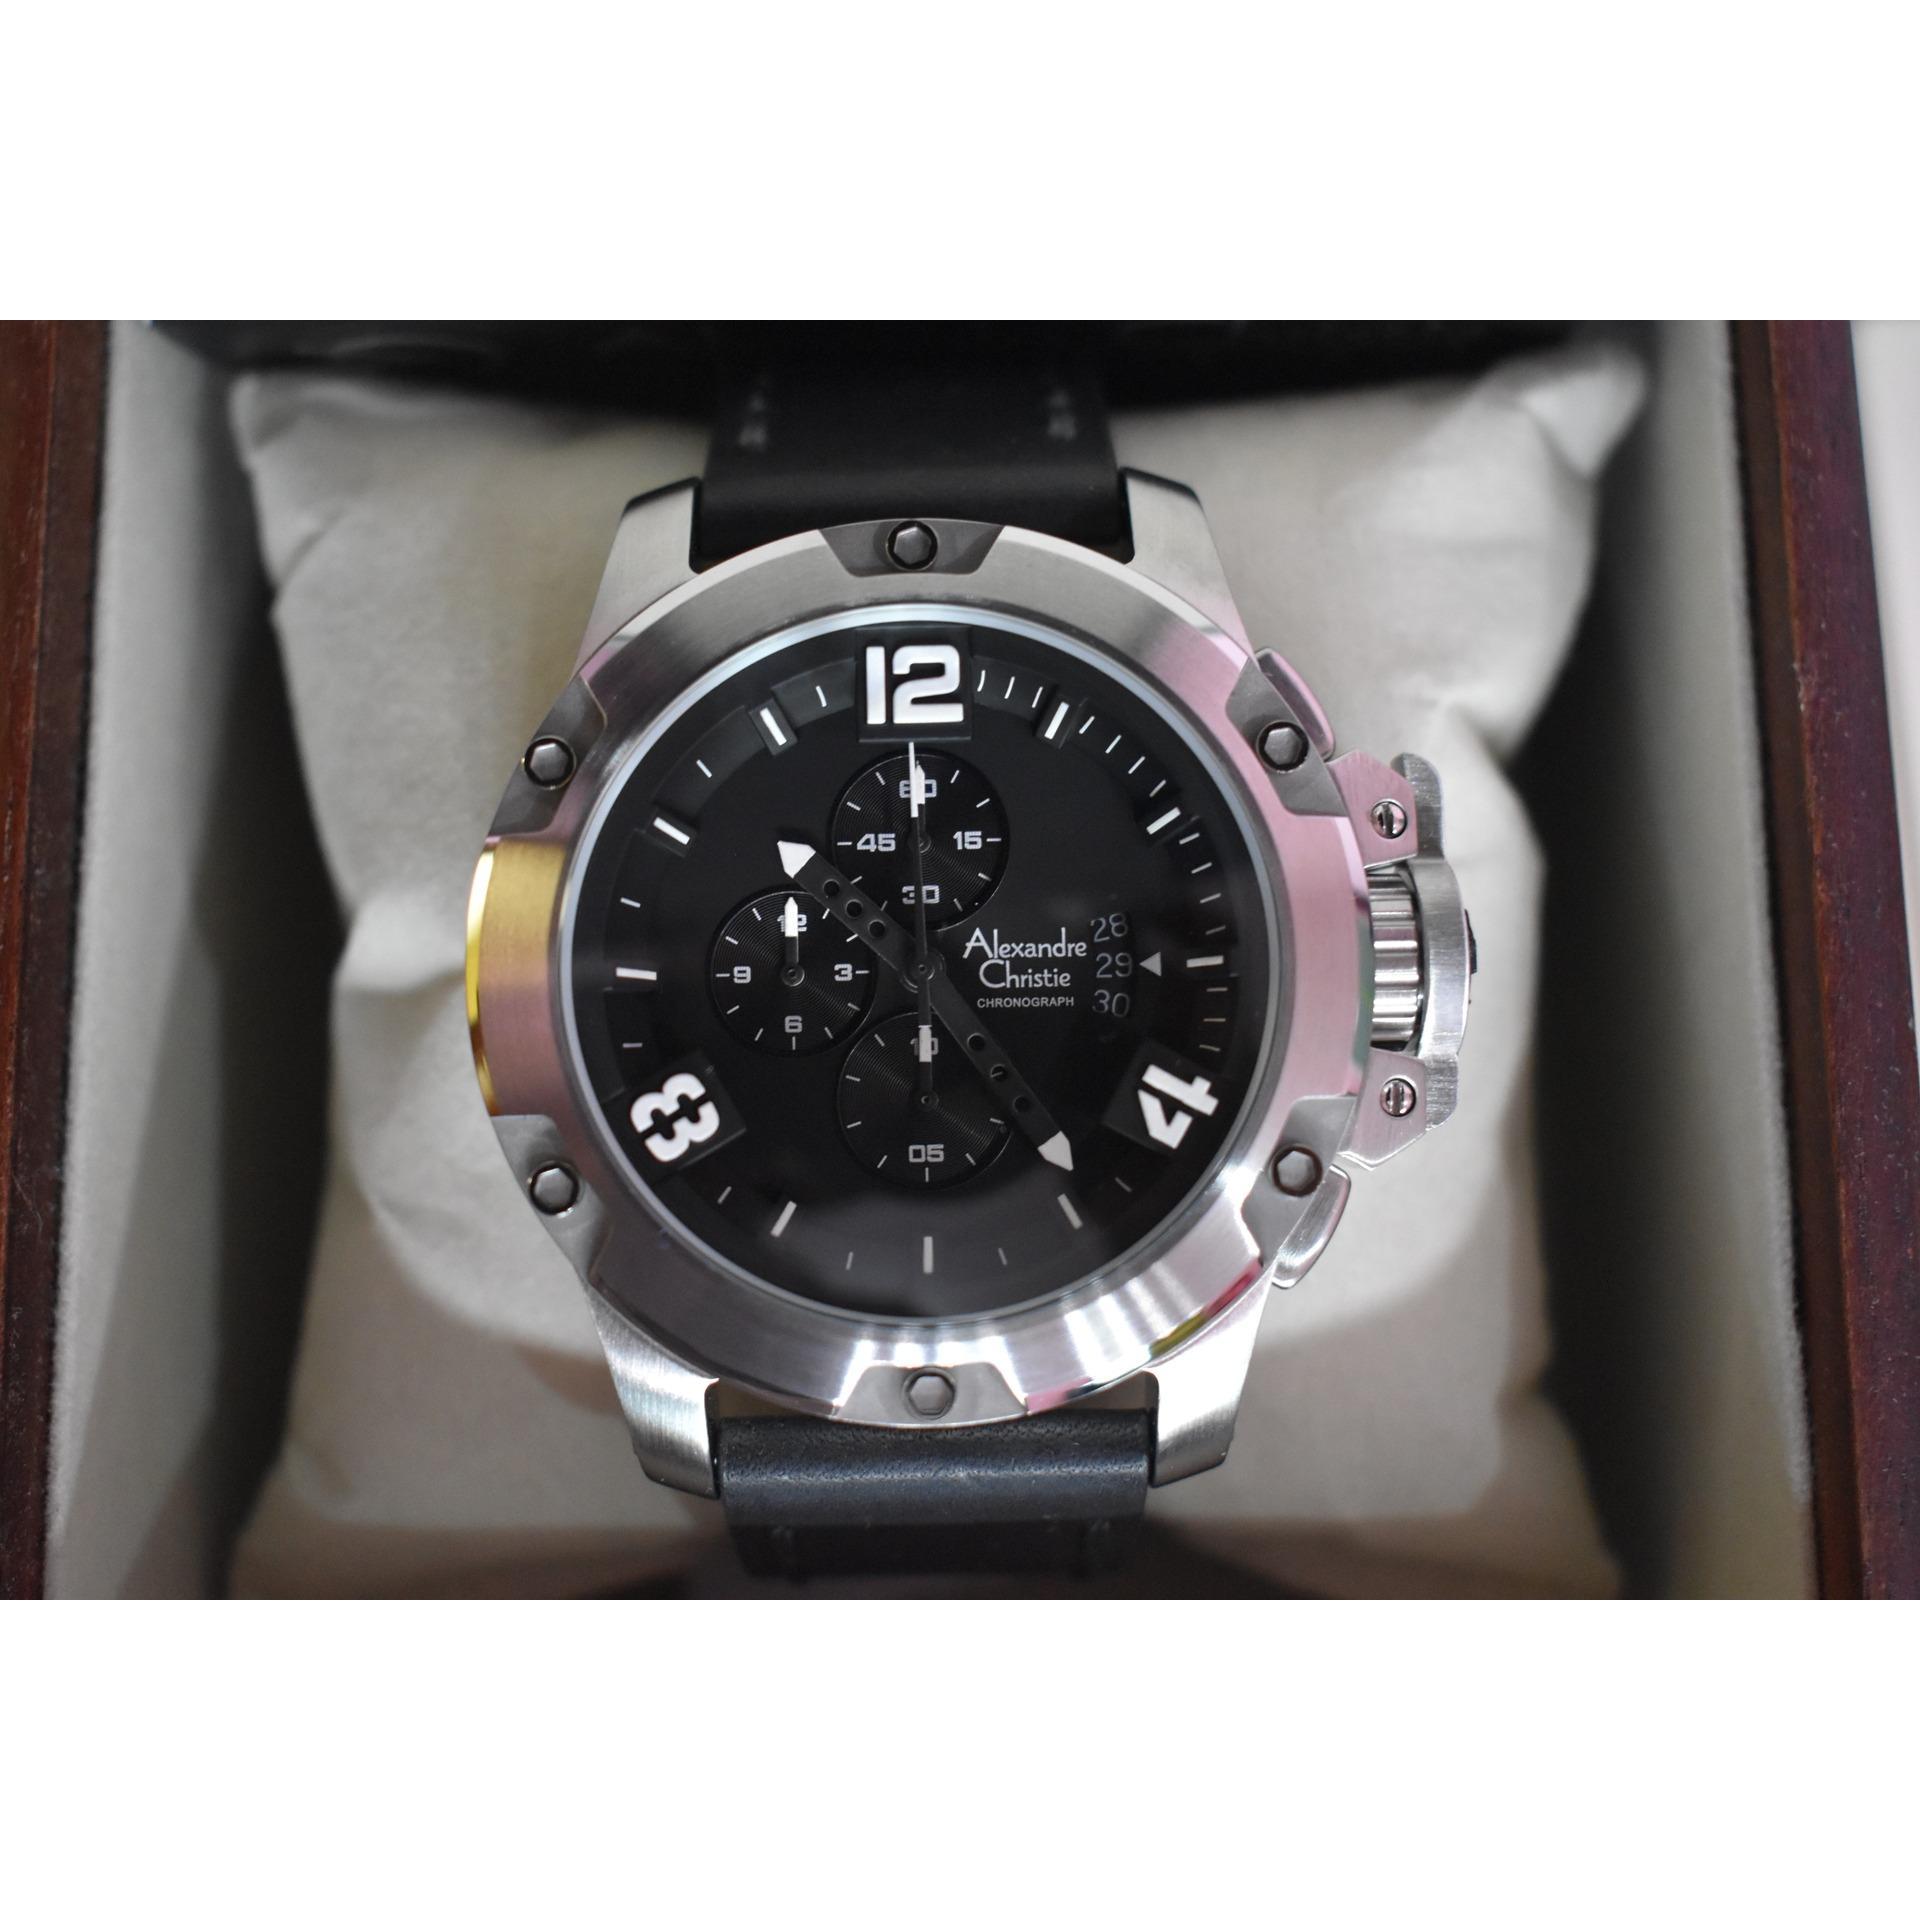 Cek Harga Baru Jam Tangan Pria Alexandre Christie Ac 6141 Mc Black Rose Gold 6295 Ac6295 Silver Leather